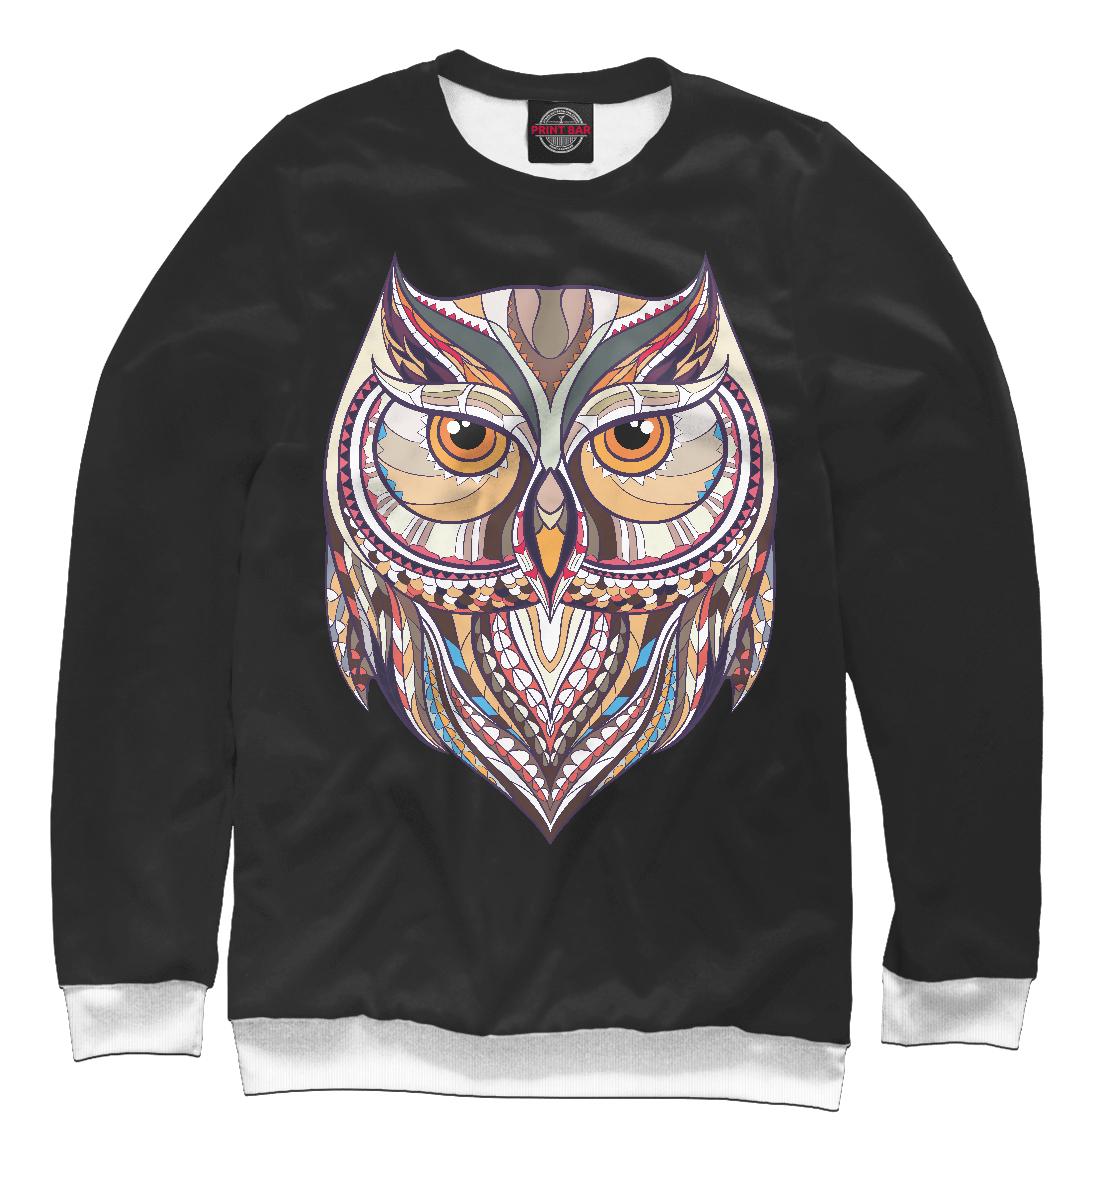 Купить Сова, Printbar, Свитшоты, OWL-165602-swi-2